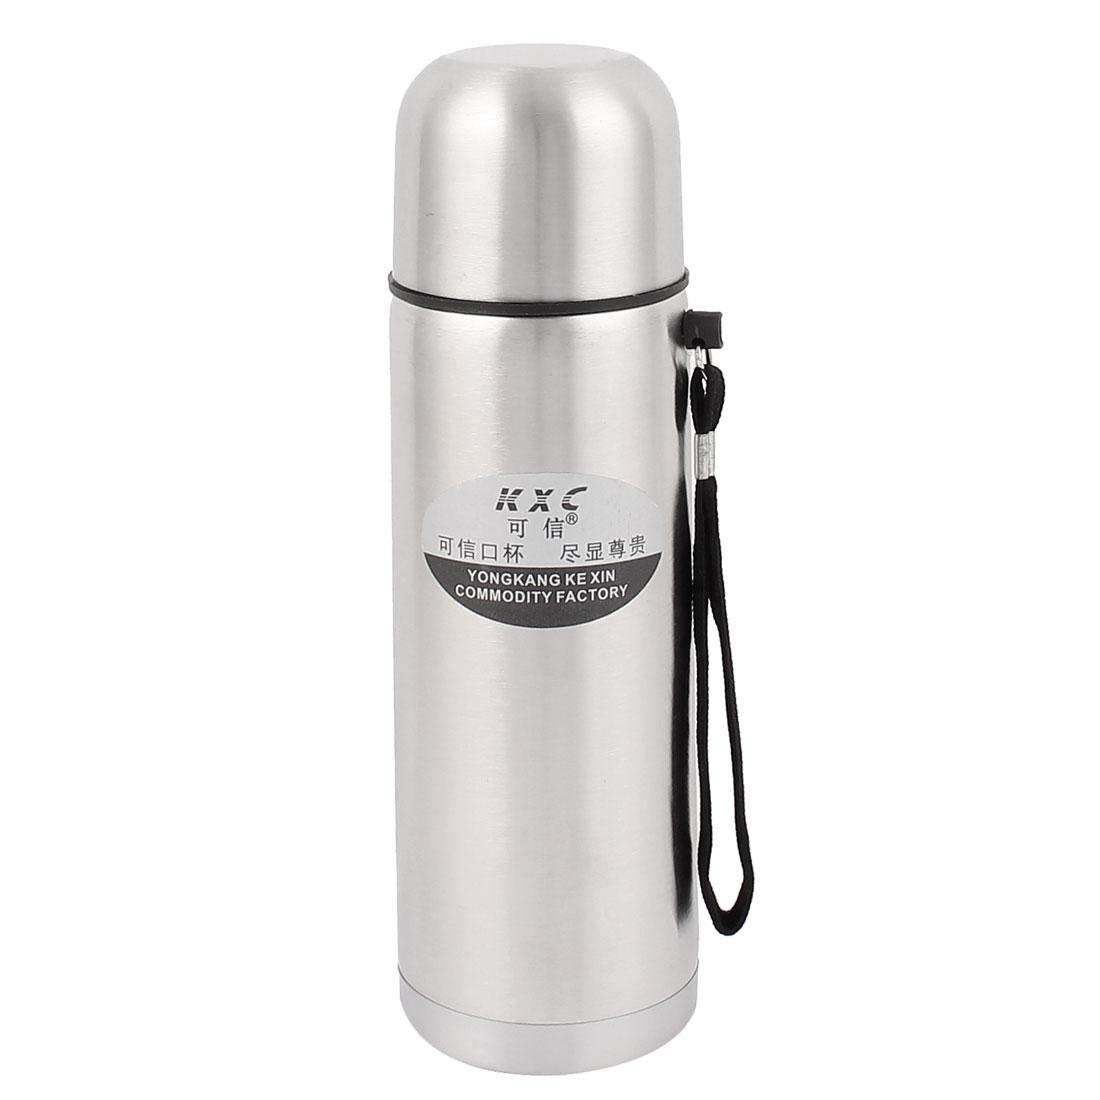 Travel 500ml Vacuum Heat Retaining Flask Water Stainless Steel Bottle w Strip